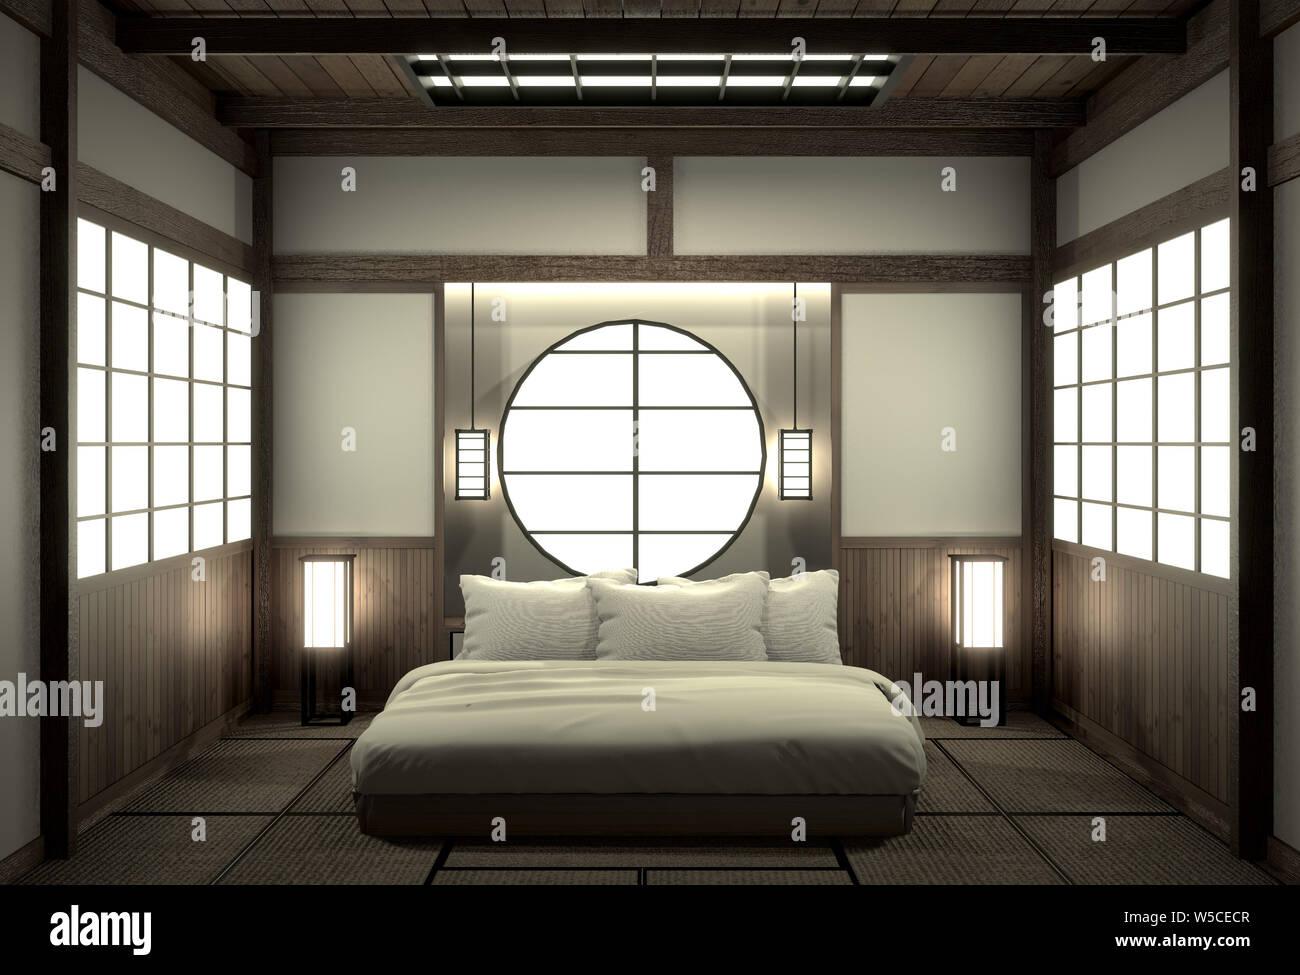 Bedroom Modern Zen Interior Design With Decoration Japanese Style 3d Rendering Stock Photo Alamy